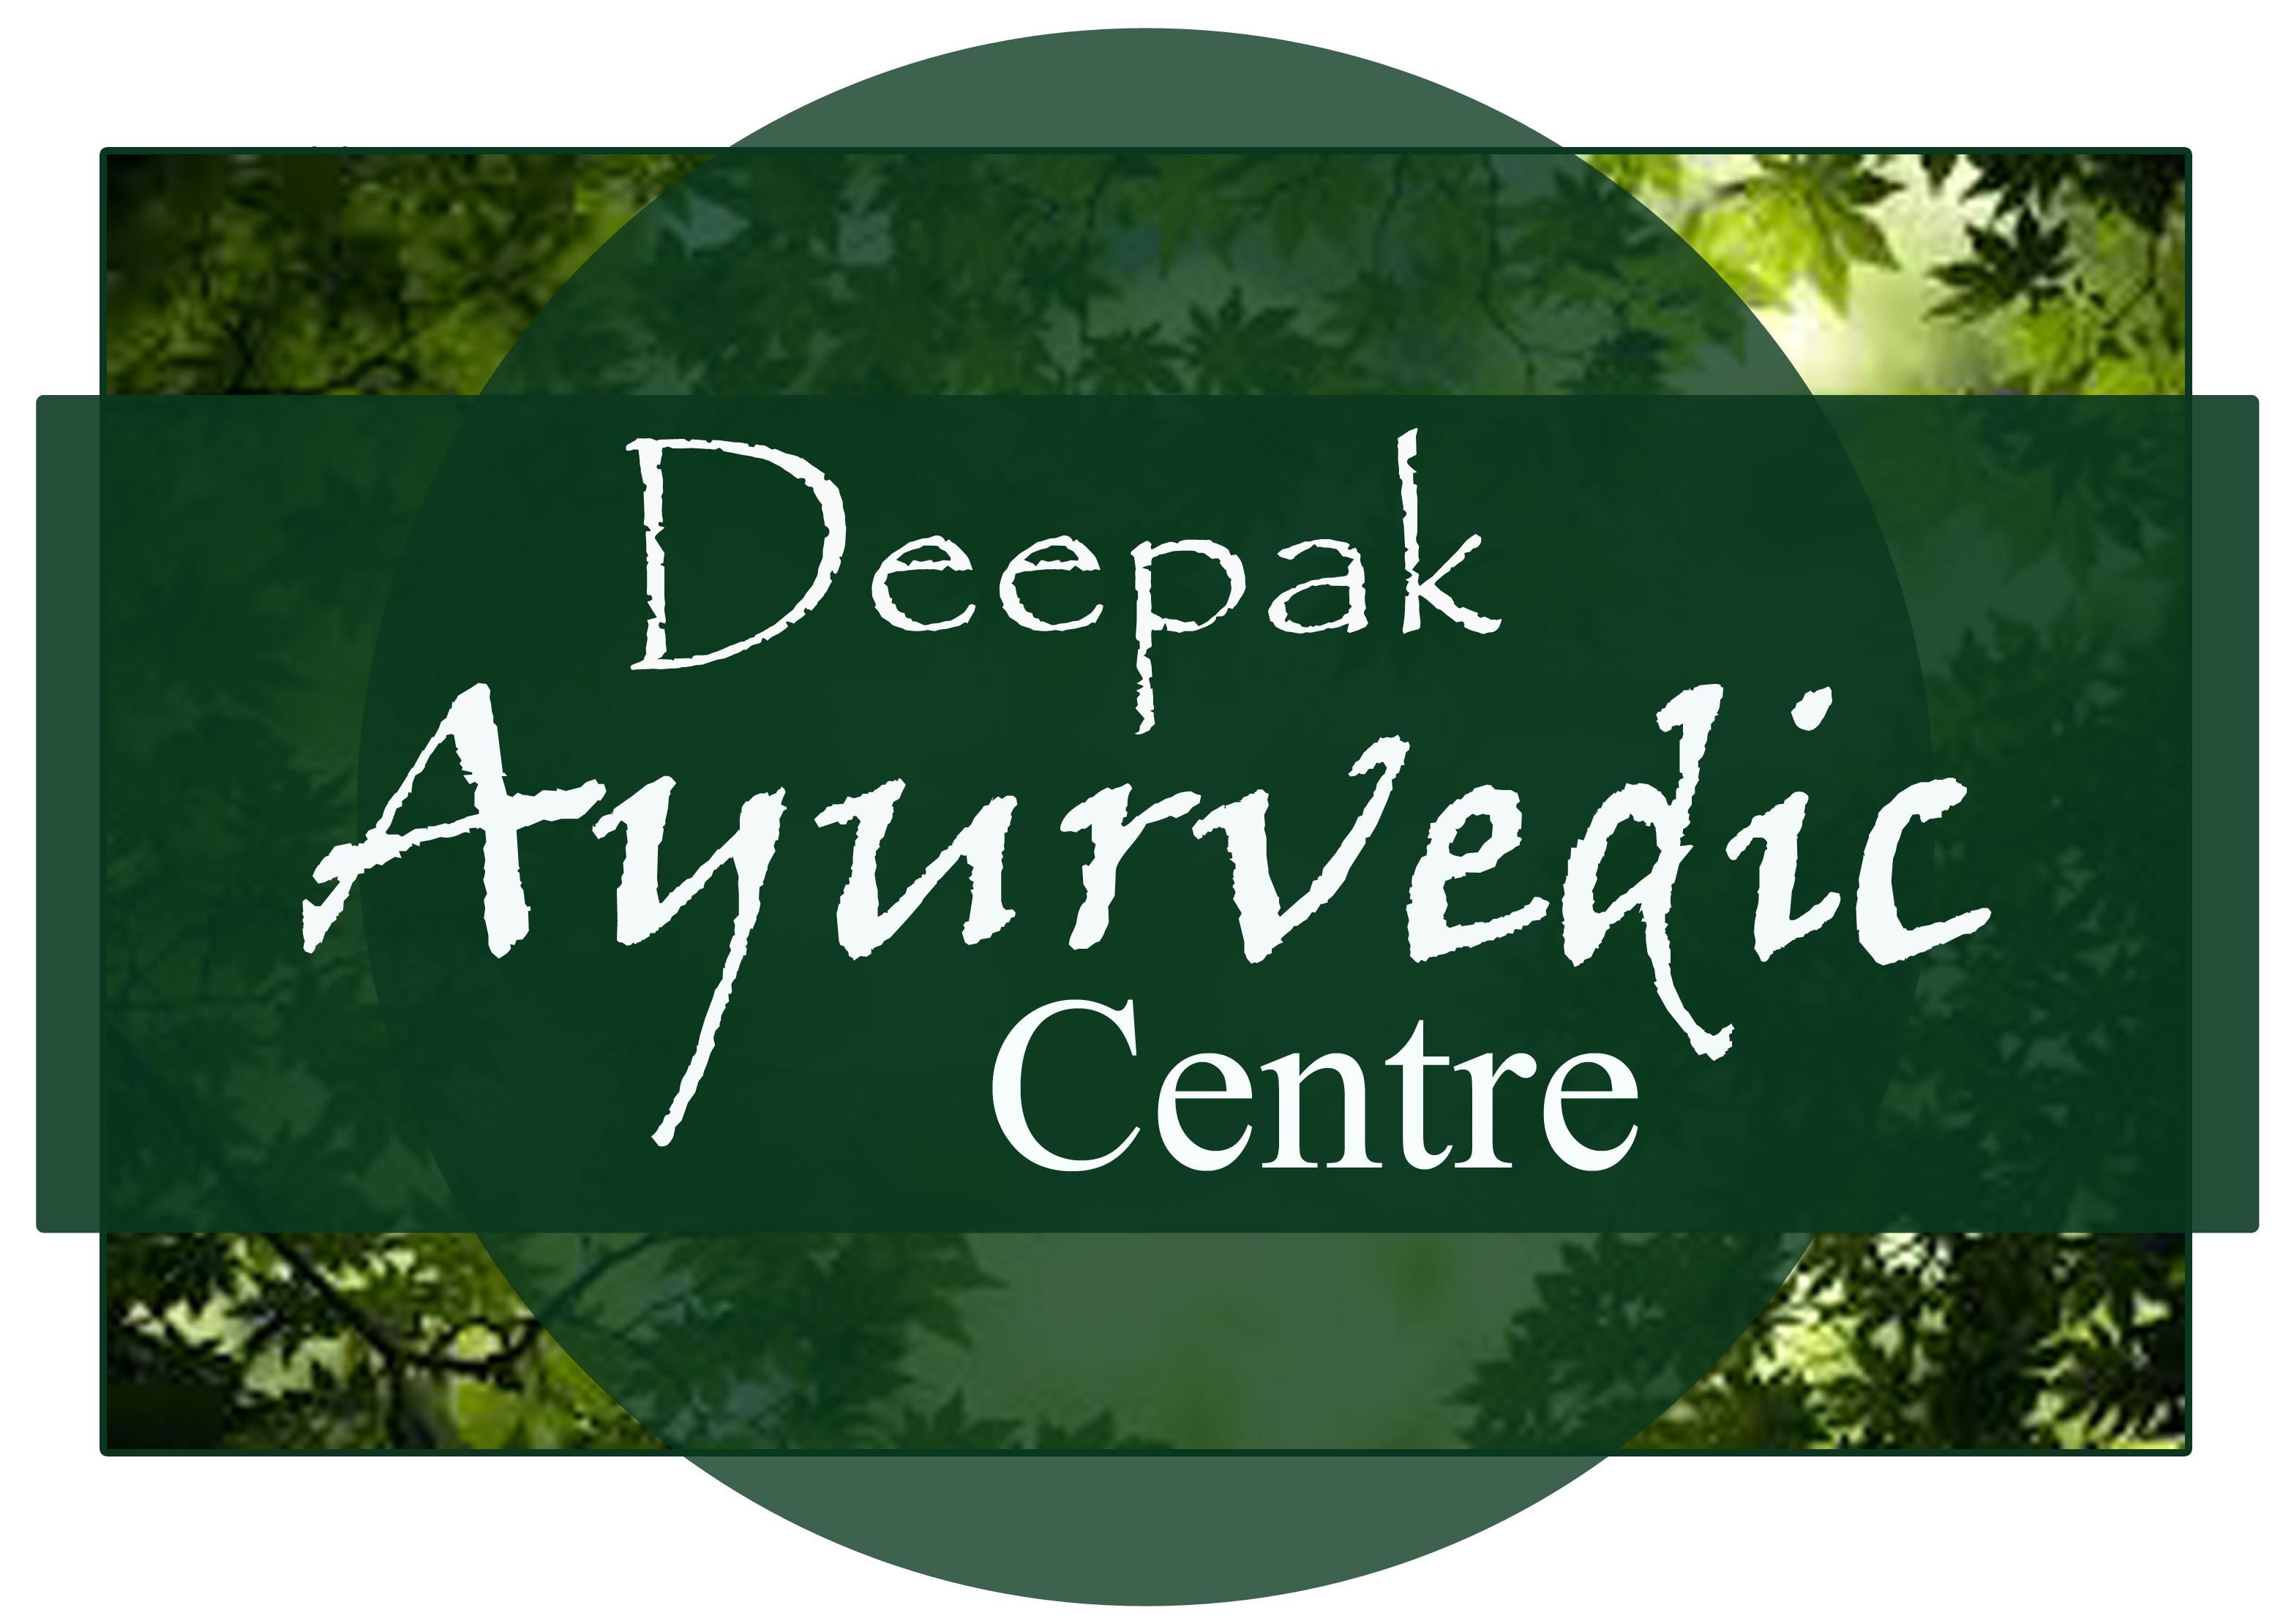 Deepak Ayurvedic Centre